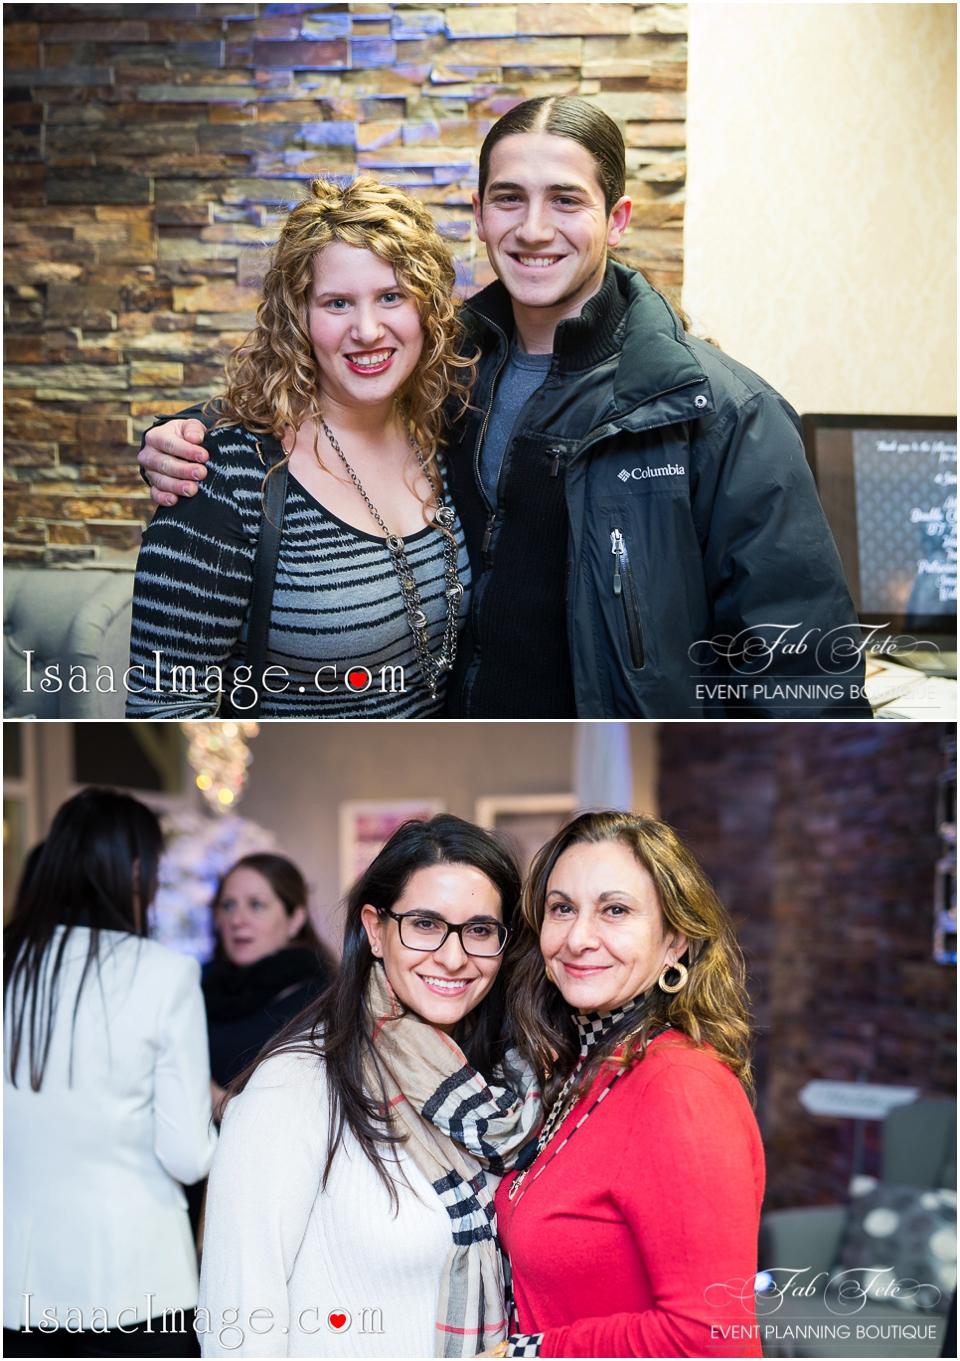 Fab Fete Toronto Wedding Event Planning Boutique open house_6483.jpg